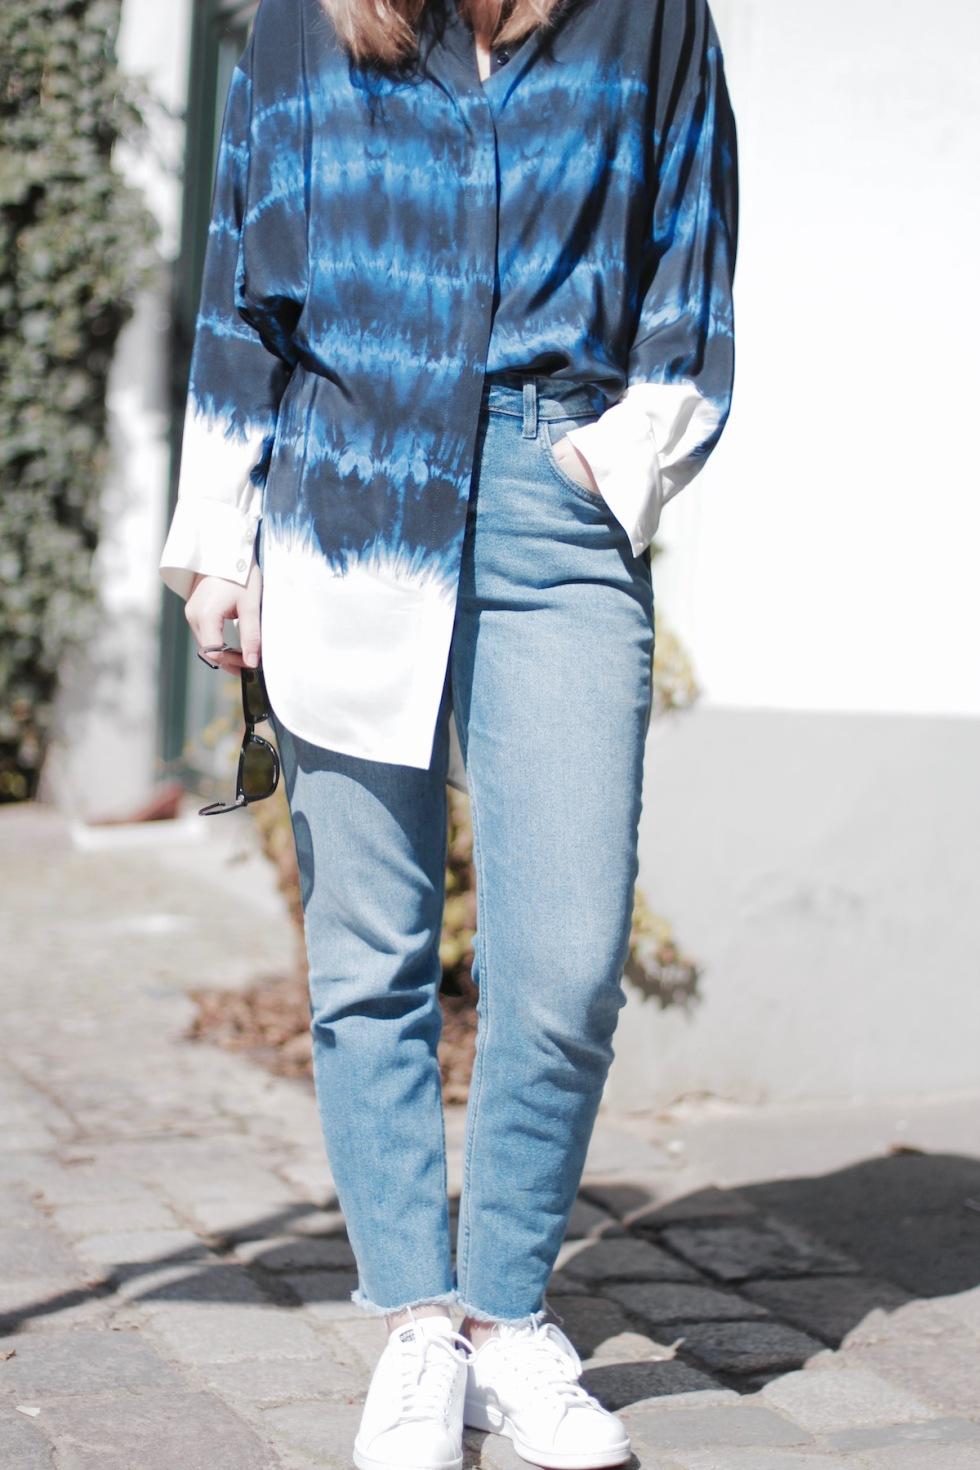 Style-by-Marie-Blog-Outfit-Blau-Batik-6